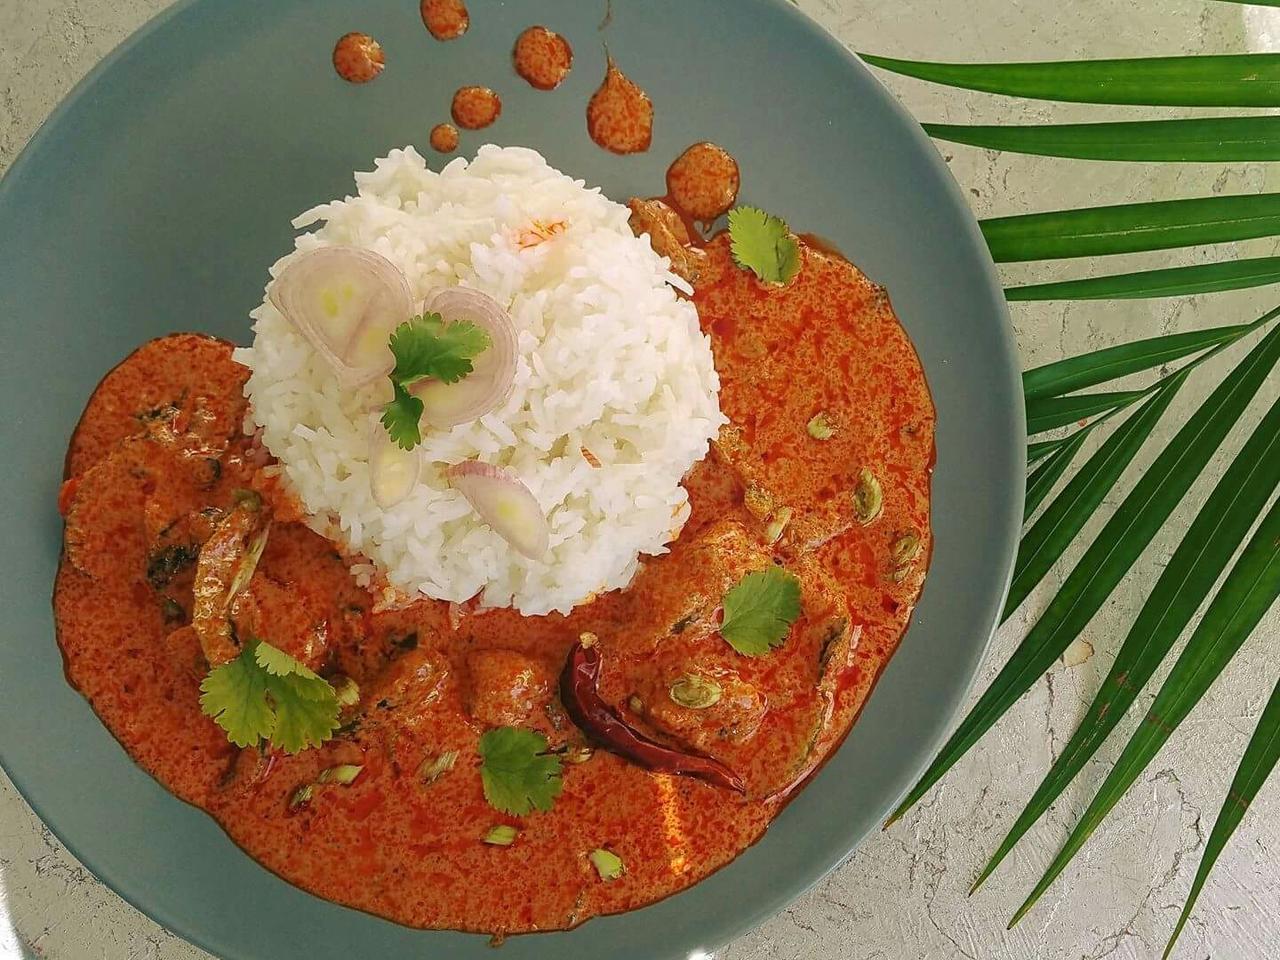 Panaeng curry cuisiné par Boong